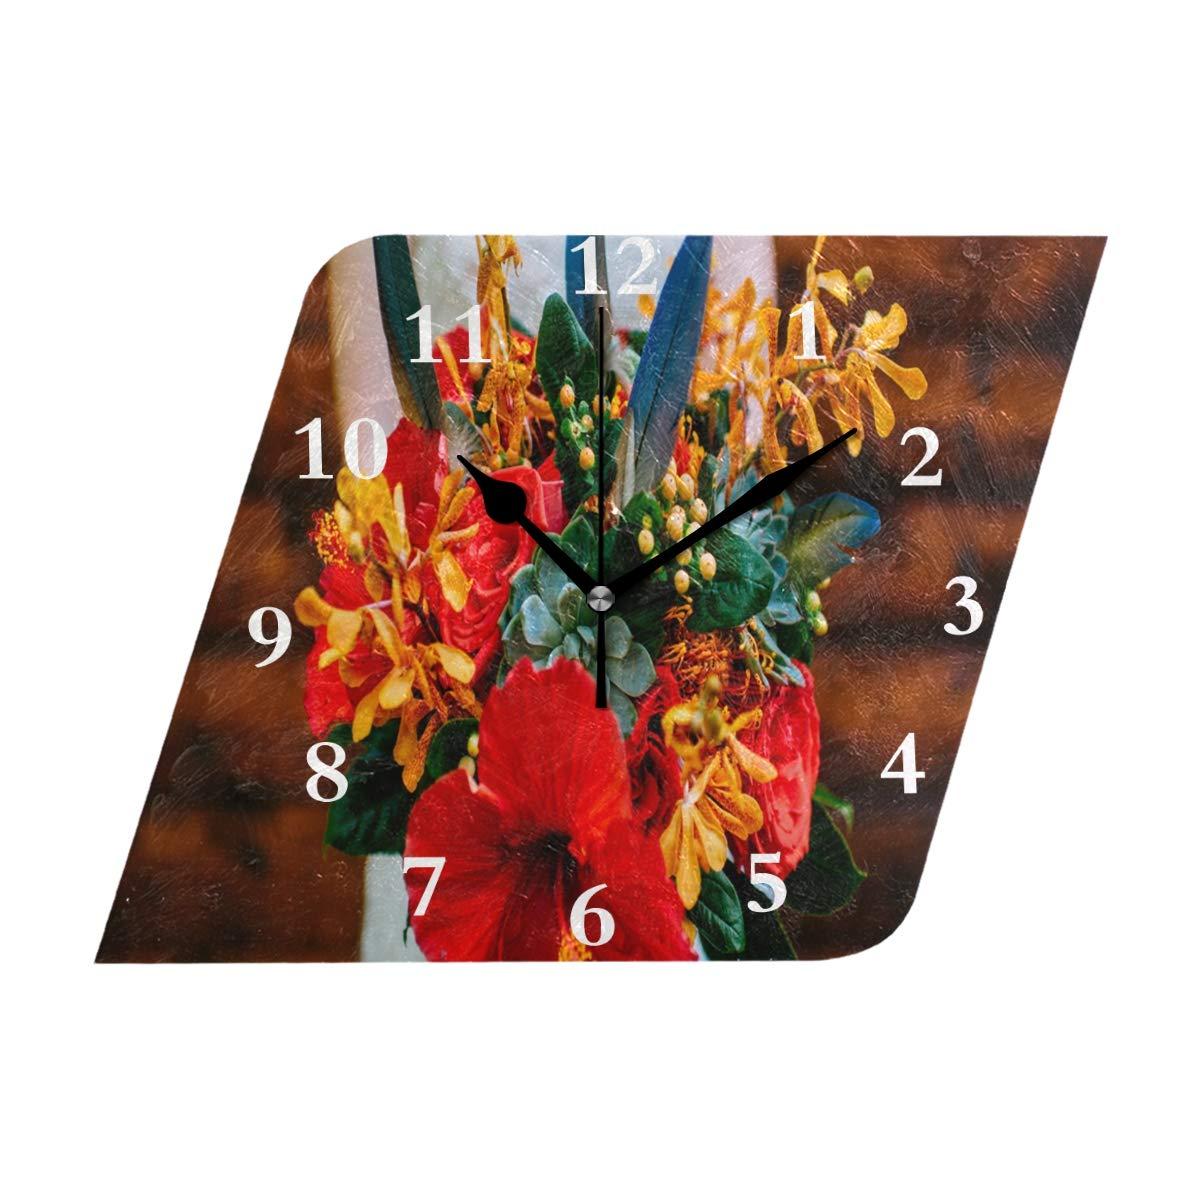 HU MOVR Wall Clock Vintage Summer Exotic Flowers Silent Non Ticking Decorative Diamond Digital Clocks Indoor Outdoor Kitchen Bedroom Living Room